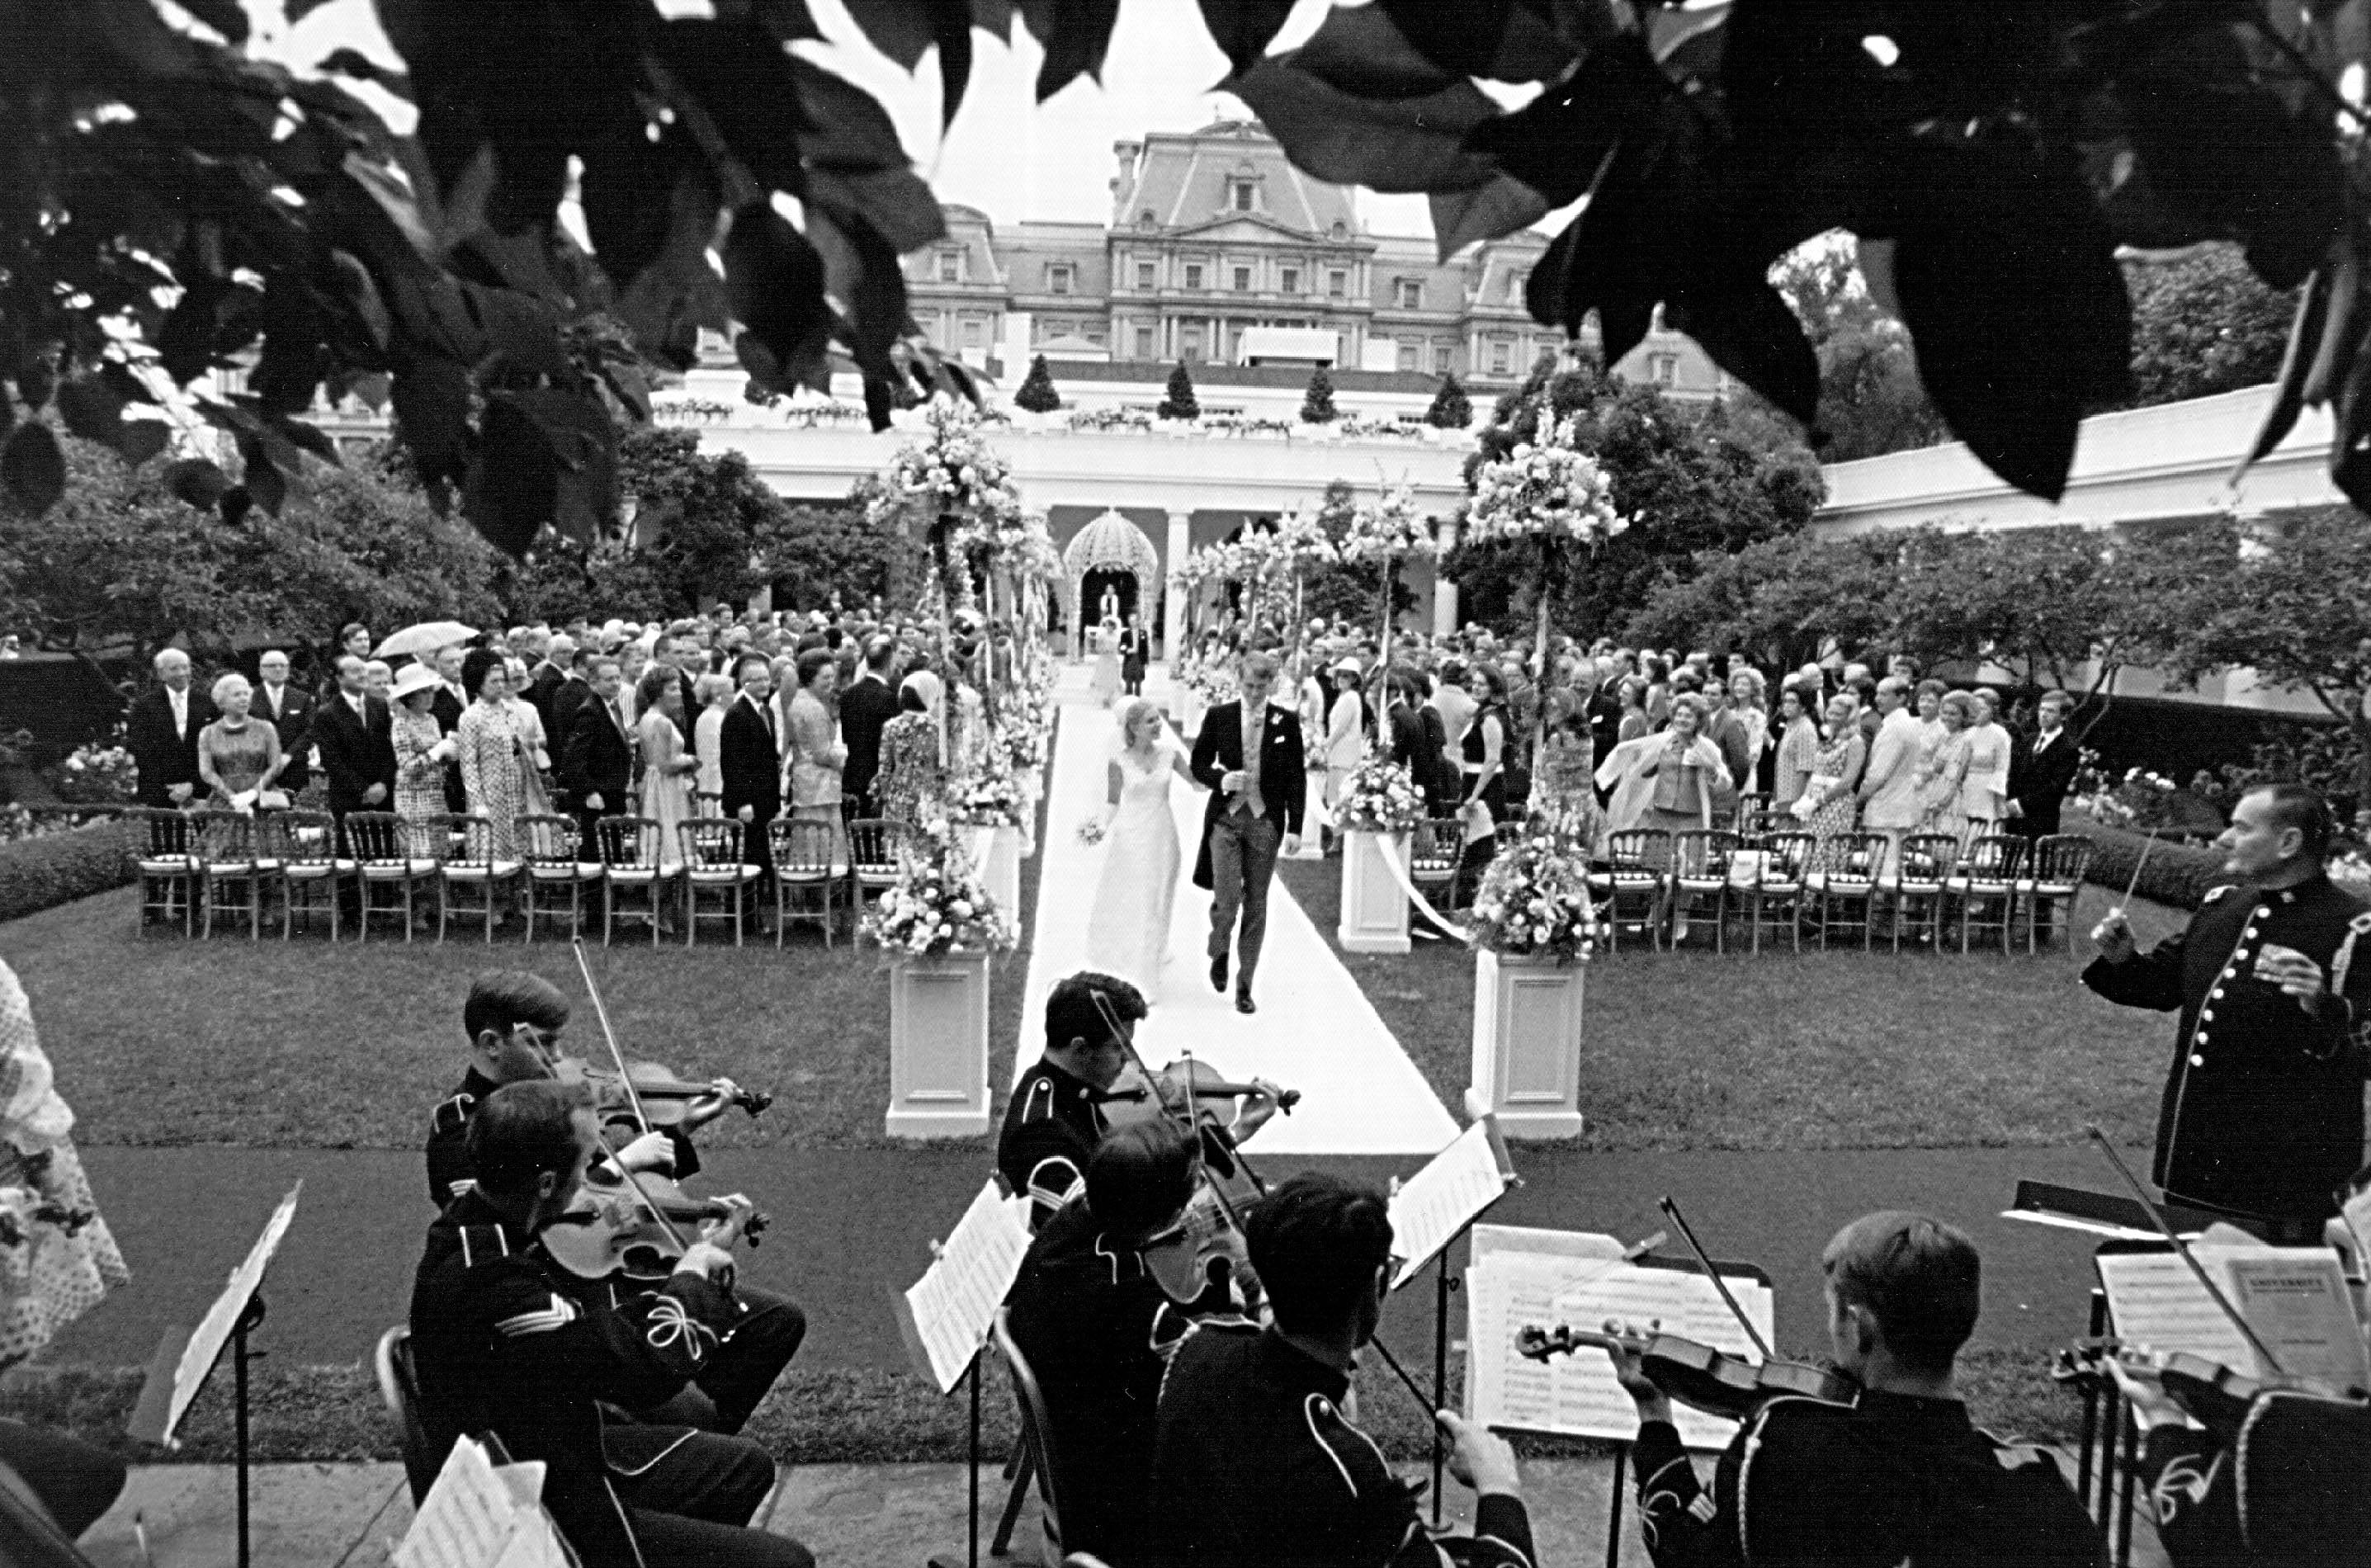 Tricia Nixon and Edward Cox Wedding